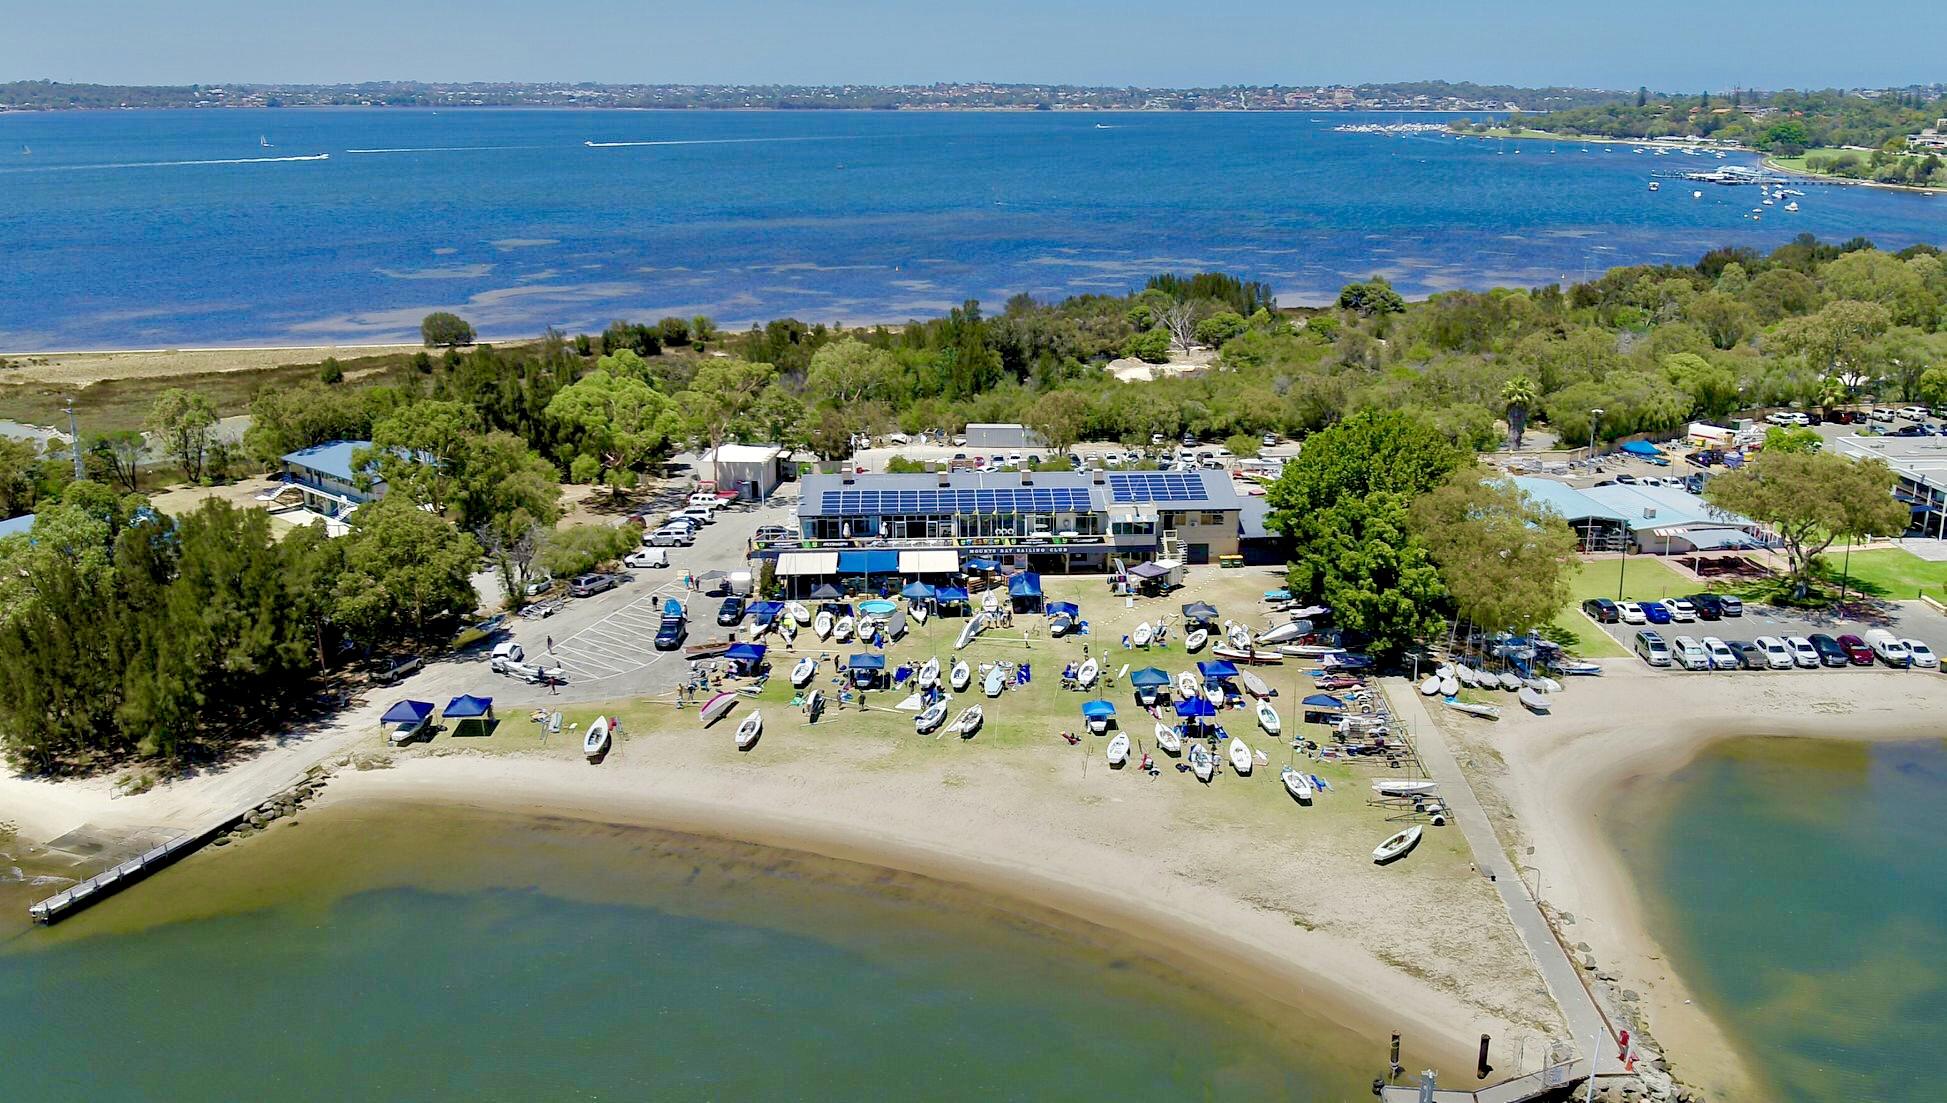 Aerial view of Mounts Bay Sailing Club